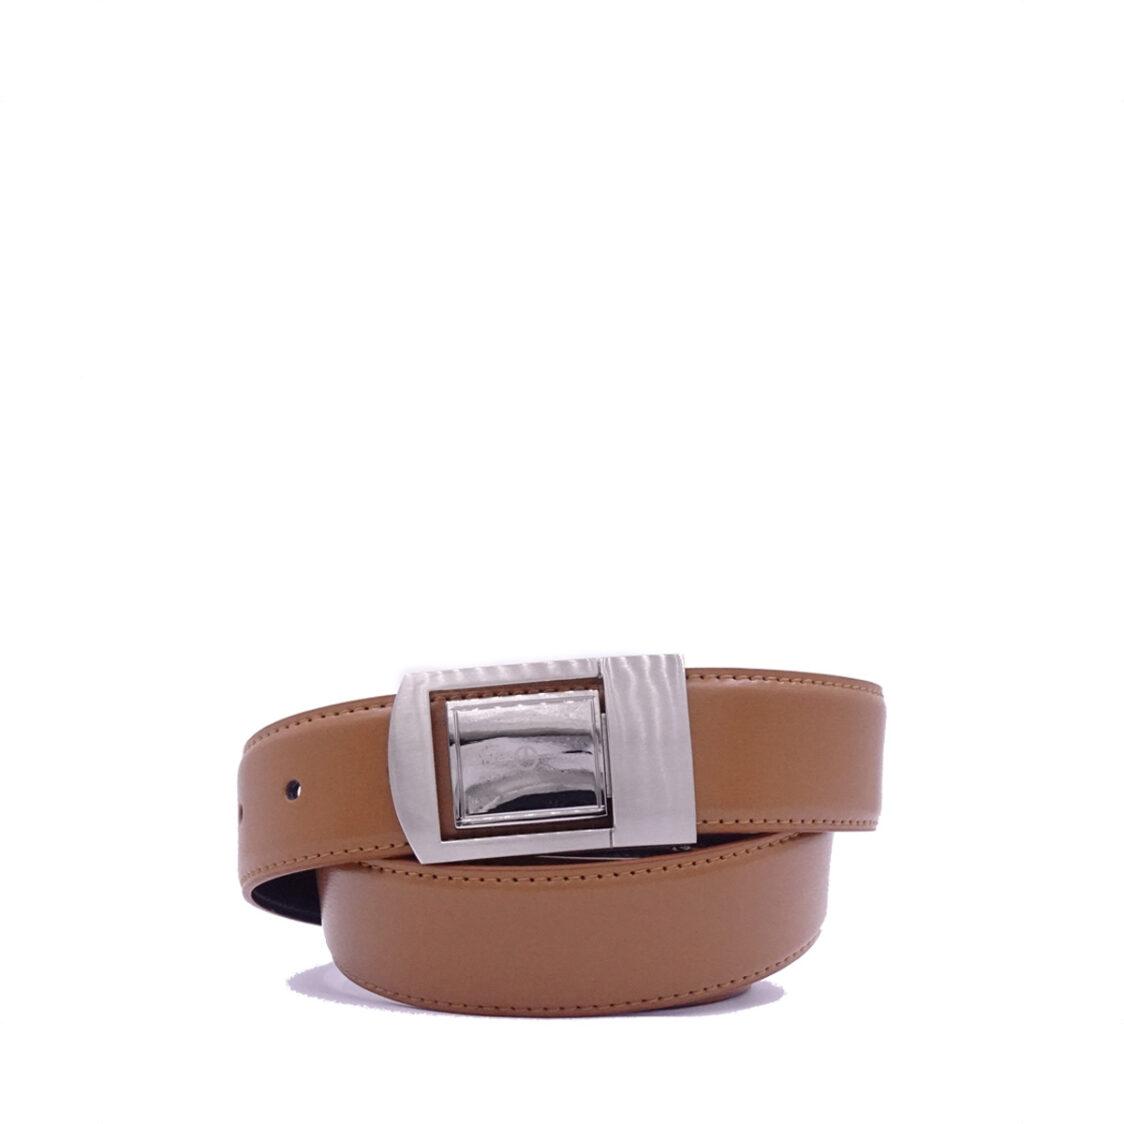 Goldlion 35mm Plate Belt